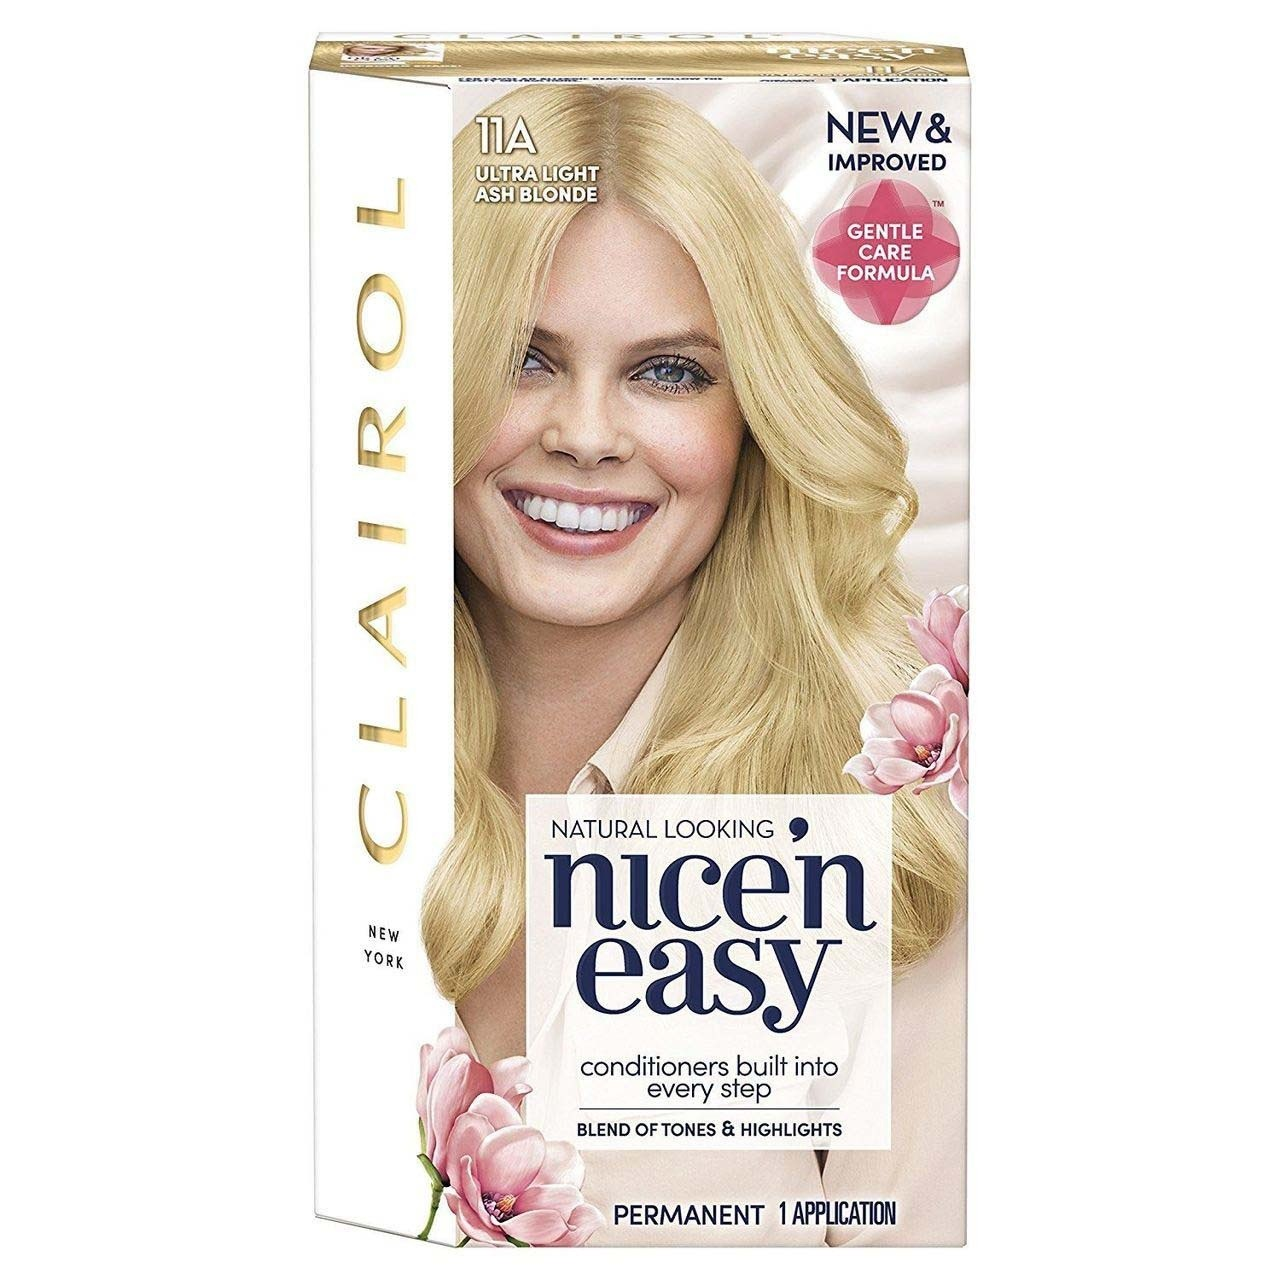 Clairol Nice'n Easy Hair Dye 11A Ultra Light Ash Blonde